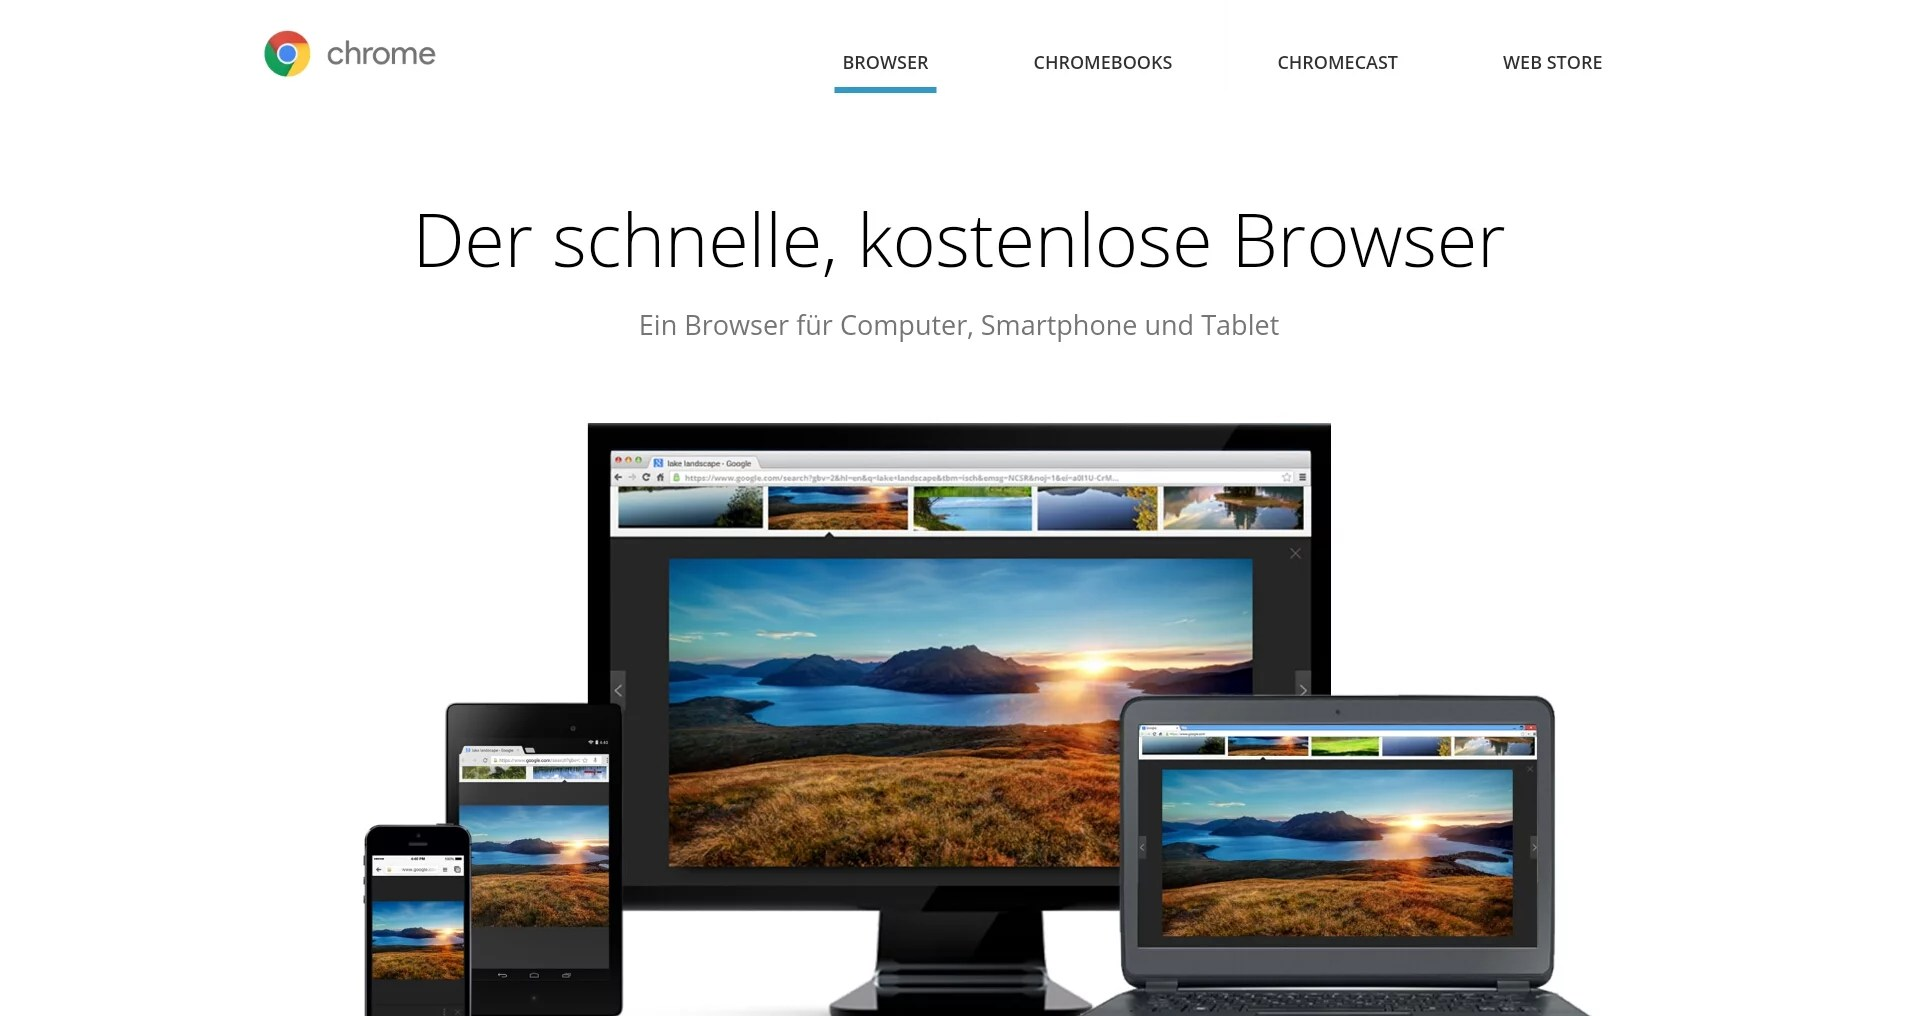 Chrome-Download-Seite im Screenshot